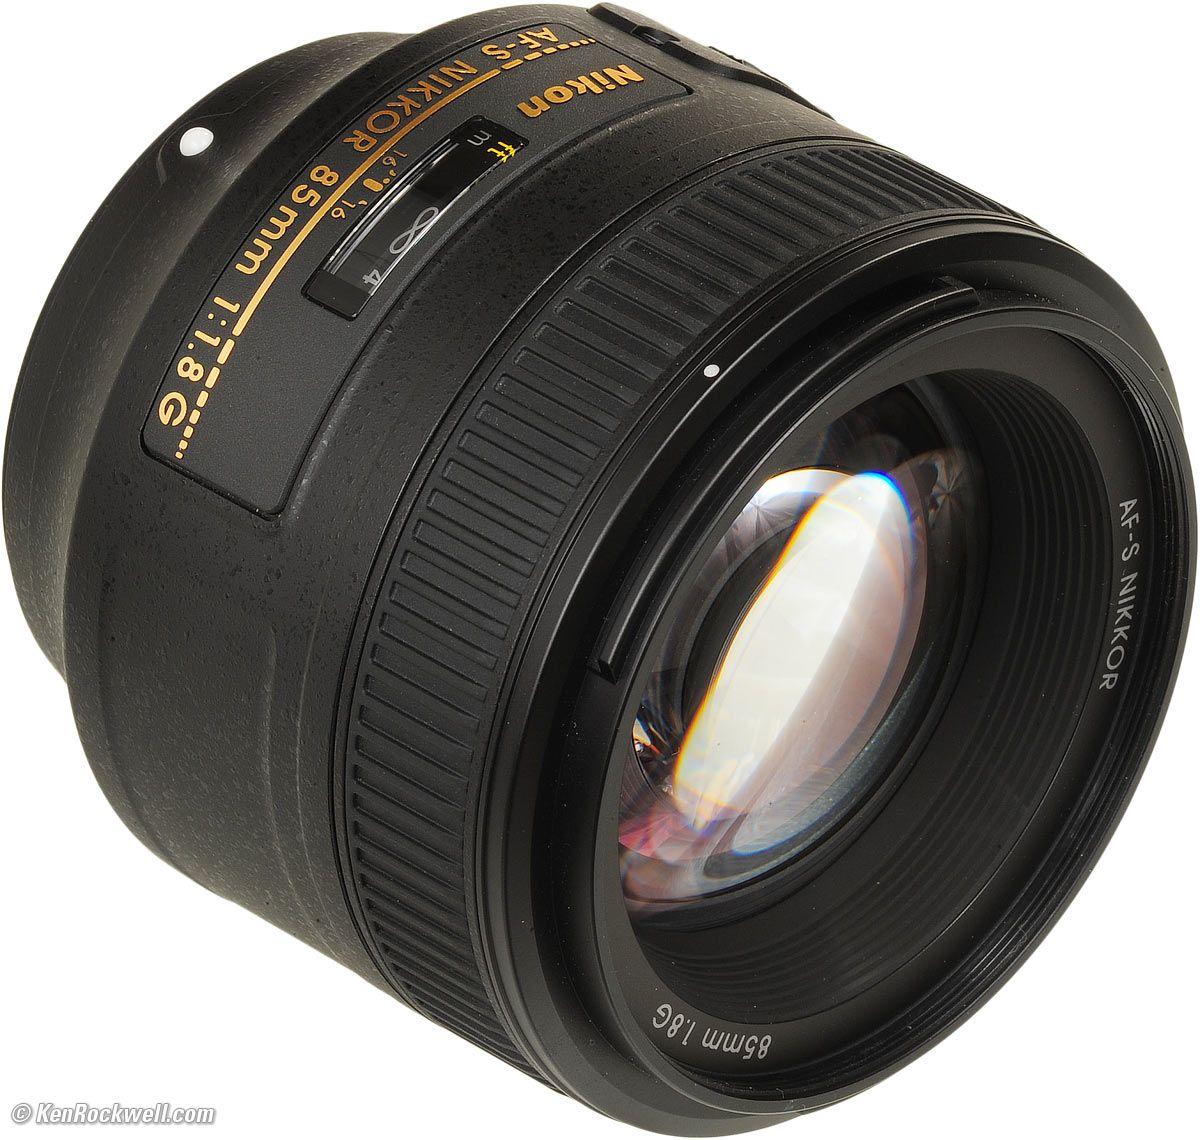 Nikon 85mm F 1 8 Af S G Updated And Optimized For Digital This Fast Aperture Compact Medium Telephoto Fx Format Portrait Le Nikon Nikon Lenses Black Crystals